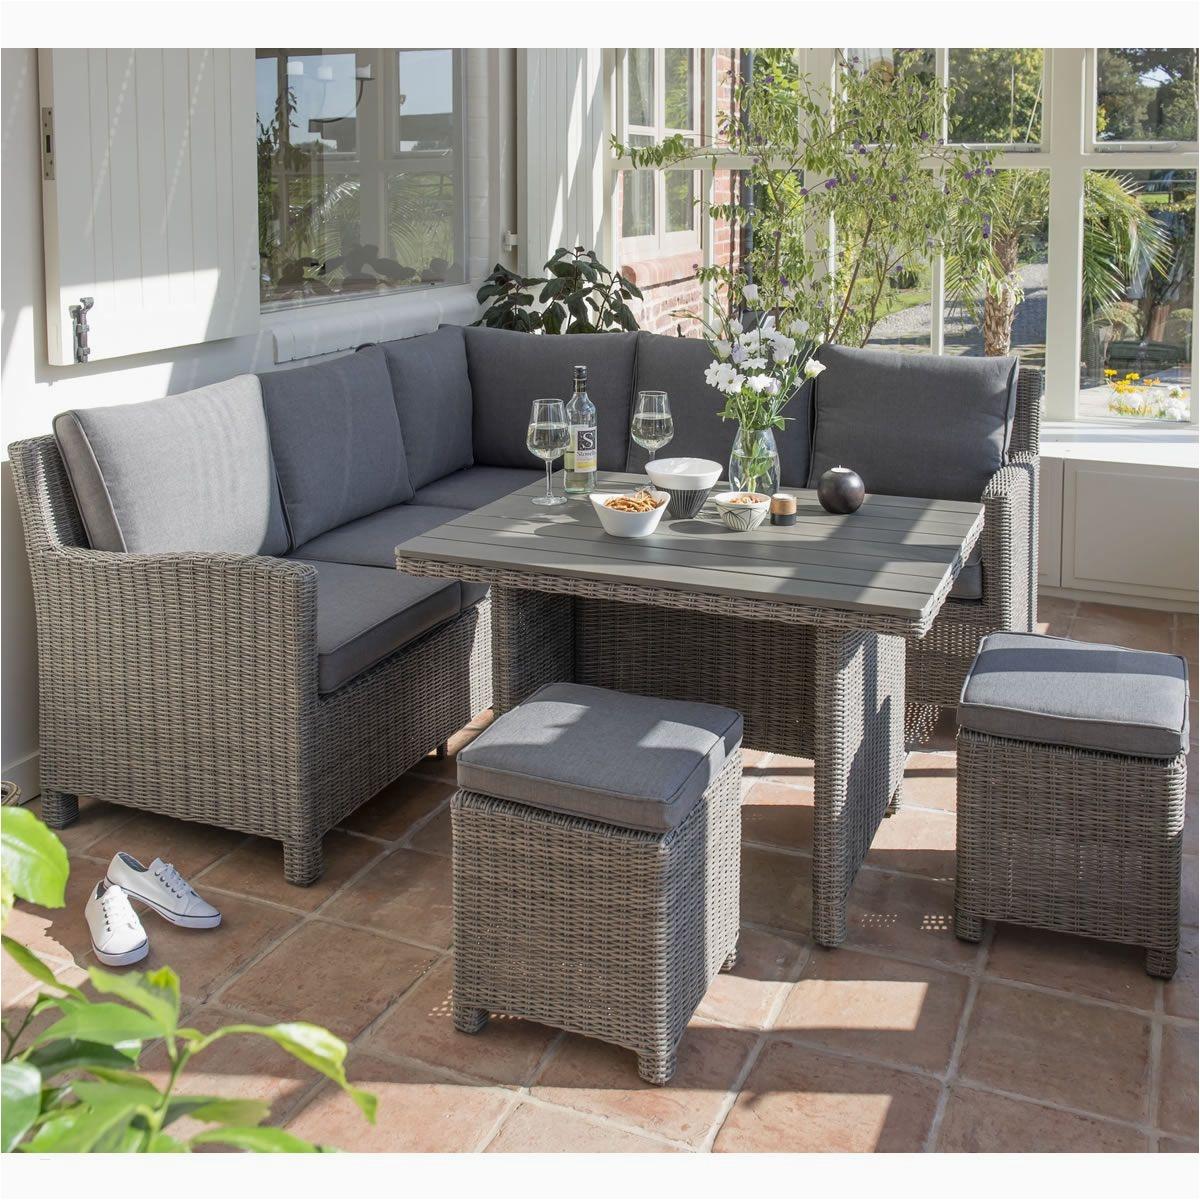 joss and main furniture unique joss and main outdoor furniture fresh maze rattan garden furniture gallery